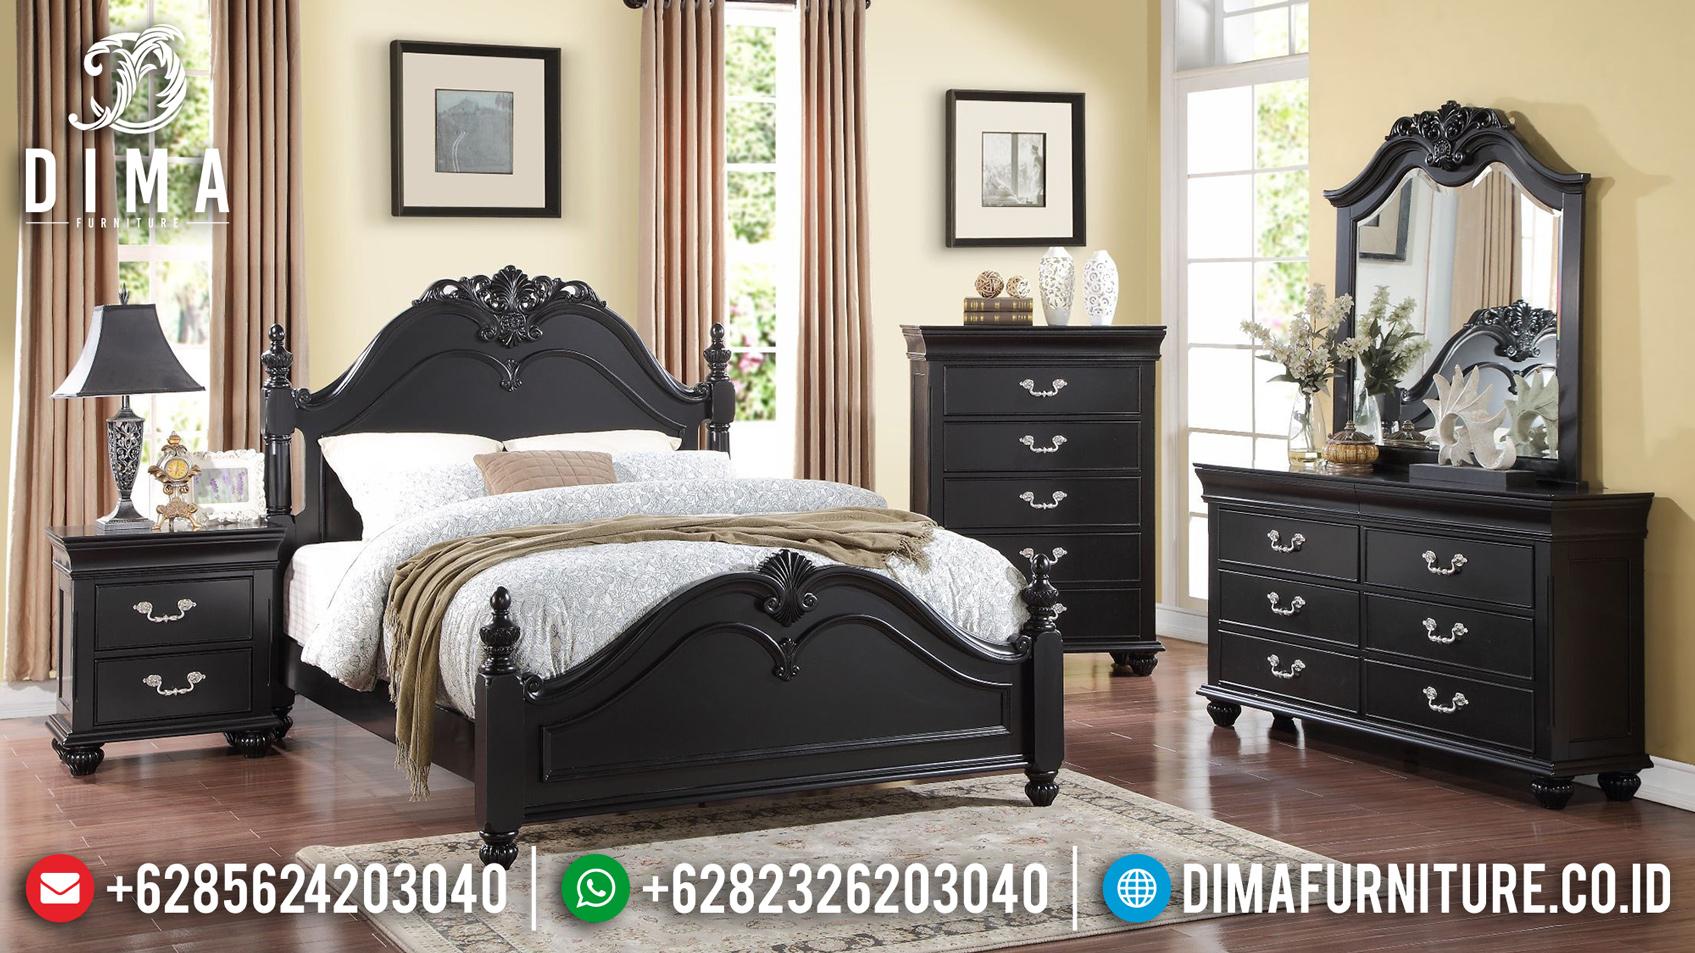 Harga Tempat Tidur Jepara Jati Model Minimalis MMJ-0131